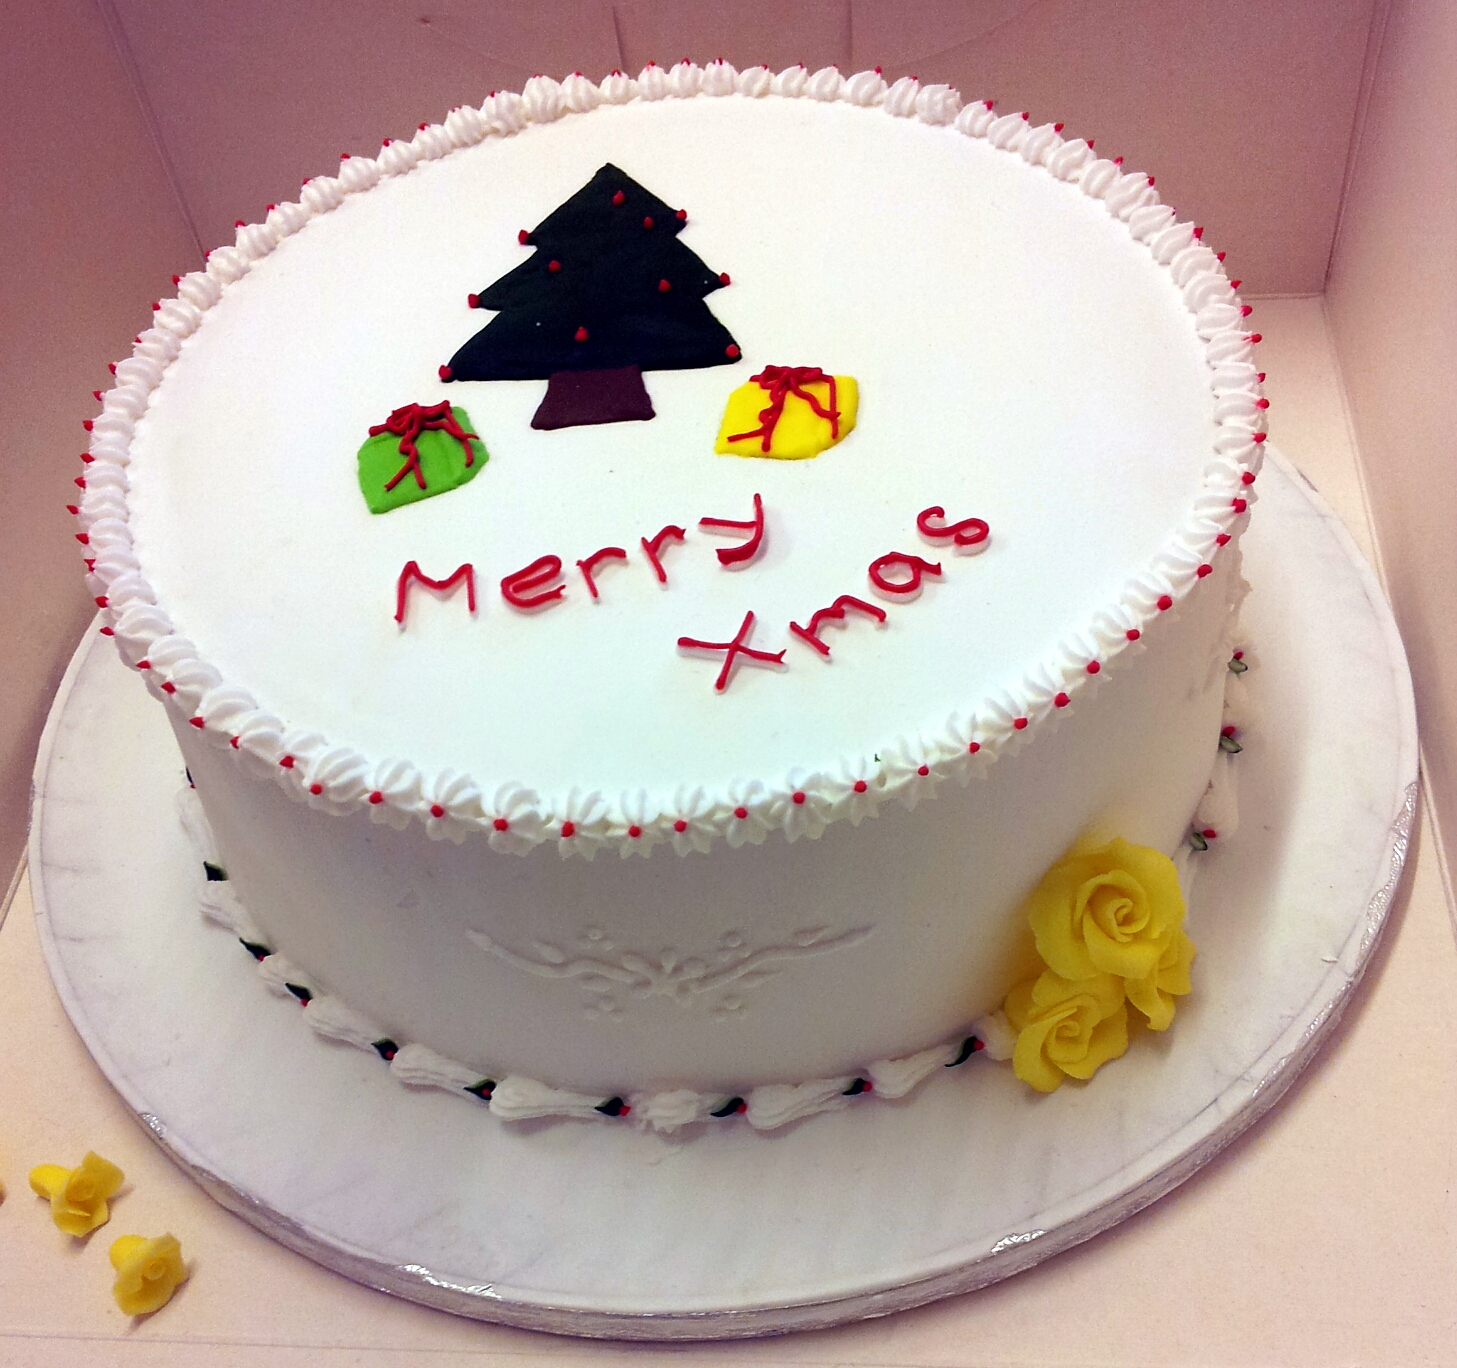 Cake Decorating Class Hk : Final Cake Decorating class & Birthday Cake! Fozia